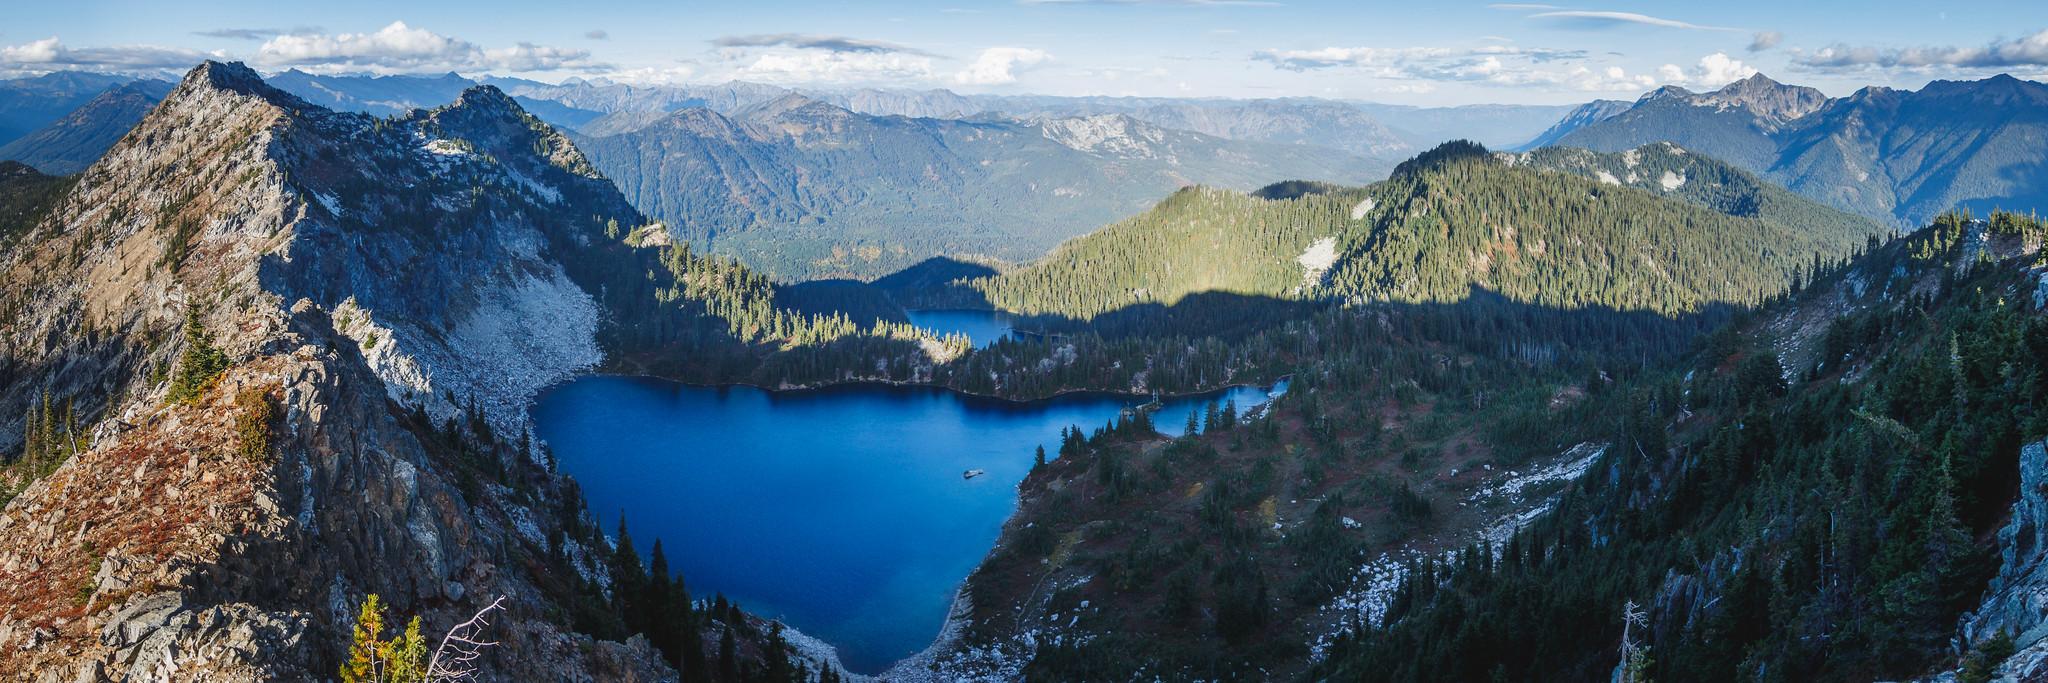 Lake basins panoramic view from Minotaur